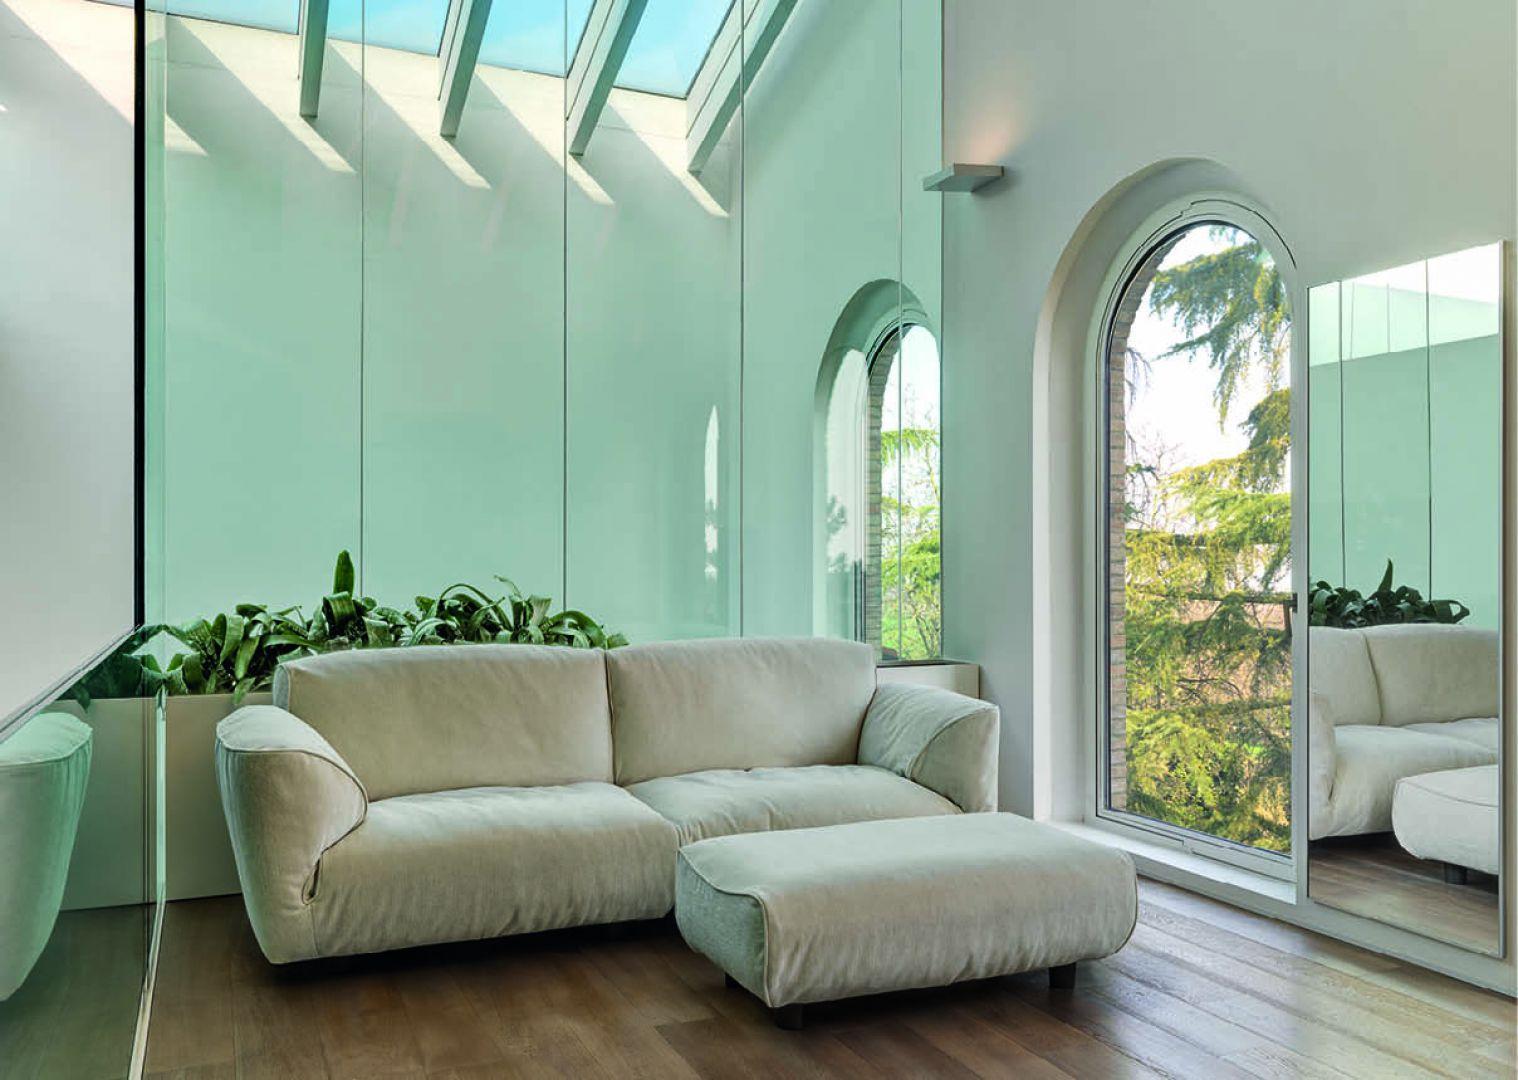 Sofa Grande Soffice. Fot. Edra